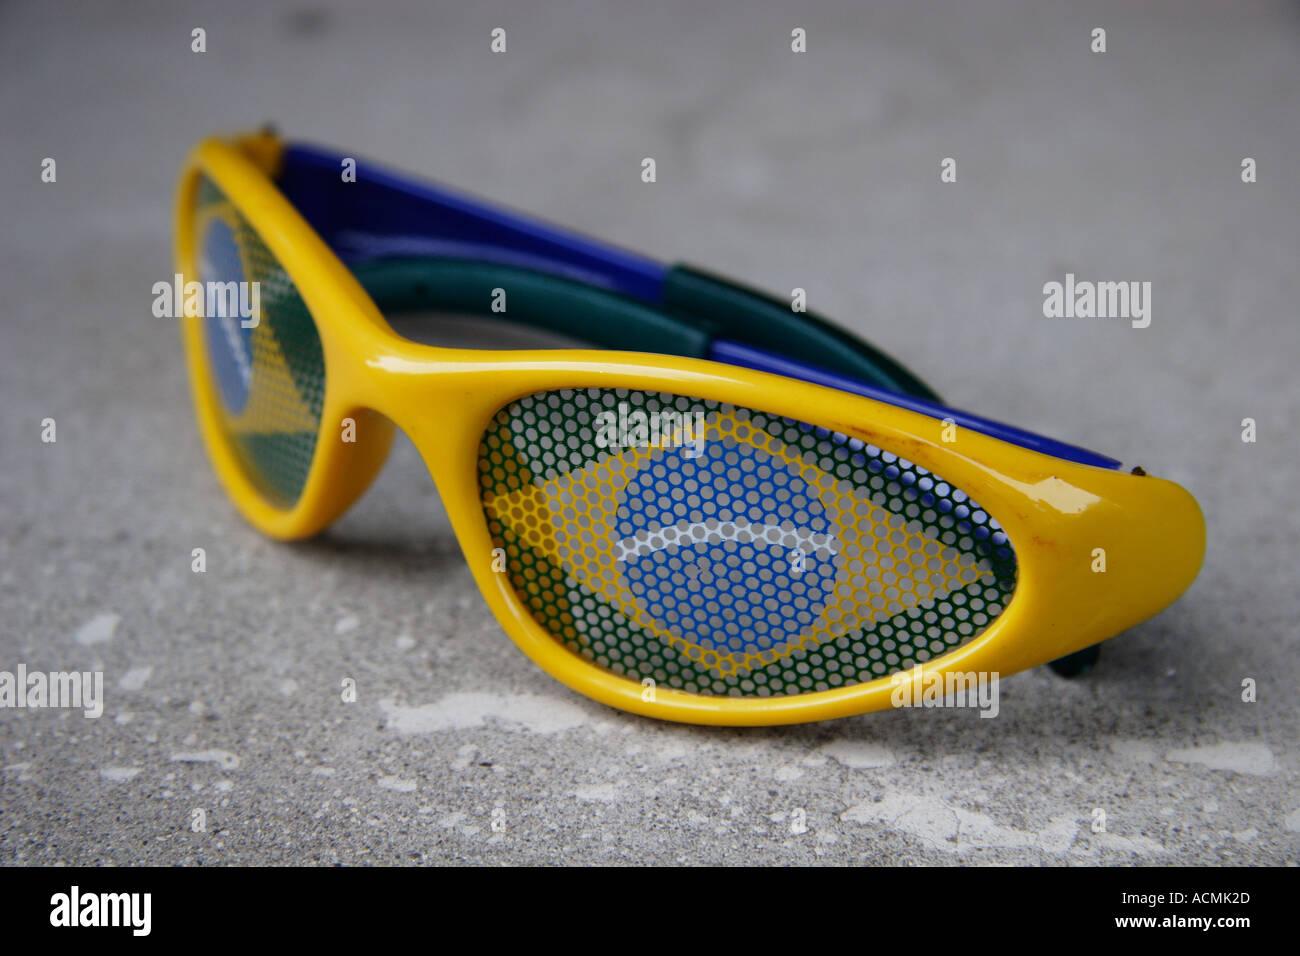 sunglass chil children color colours sun glass modern brazil - Stock Image